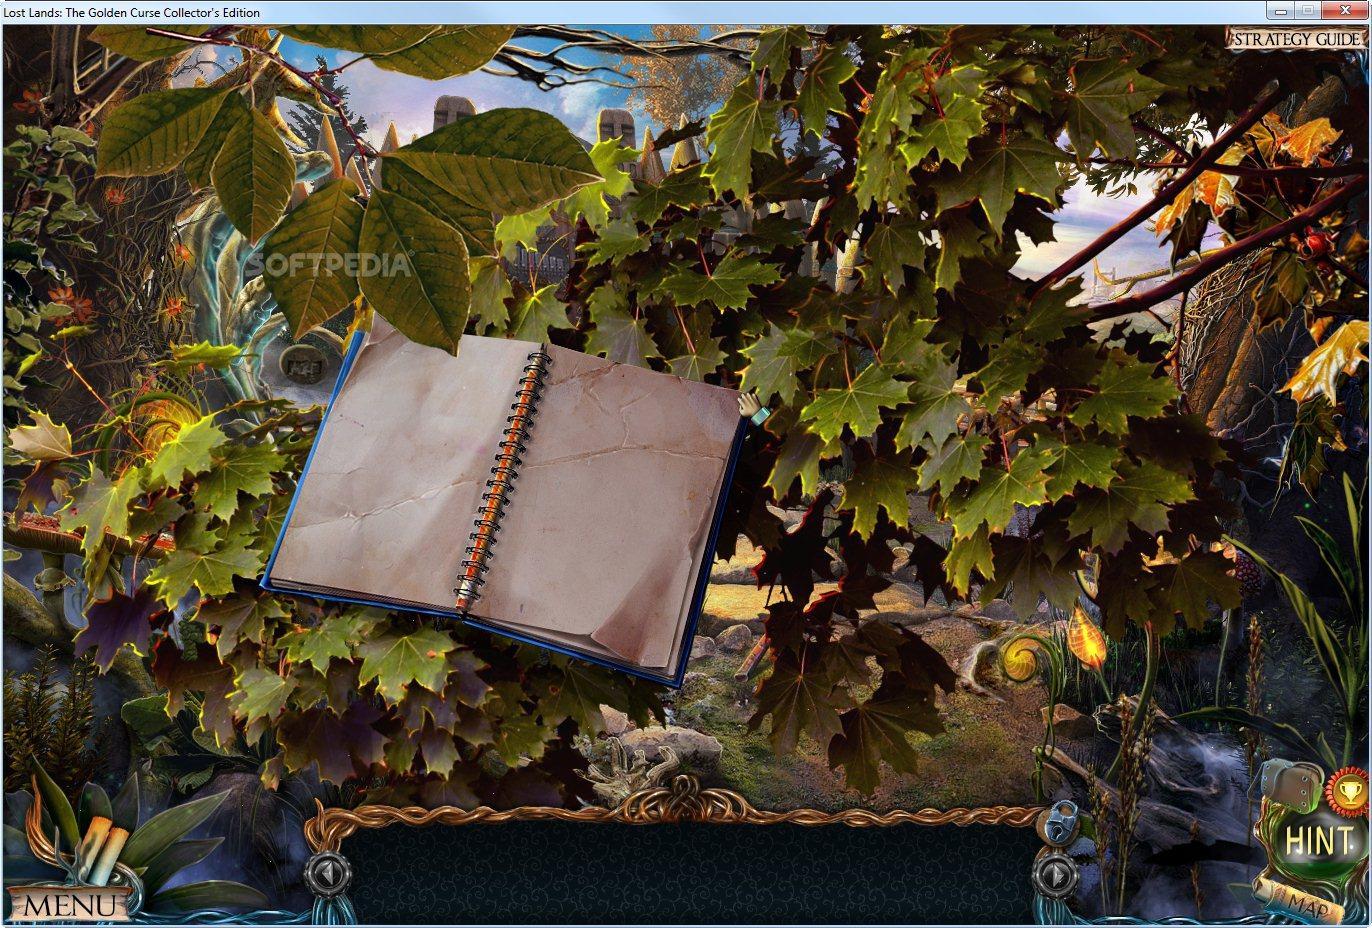 Lost Lands: The Golden Curse Download